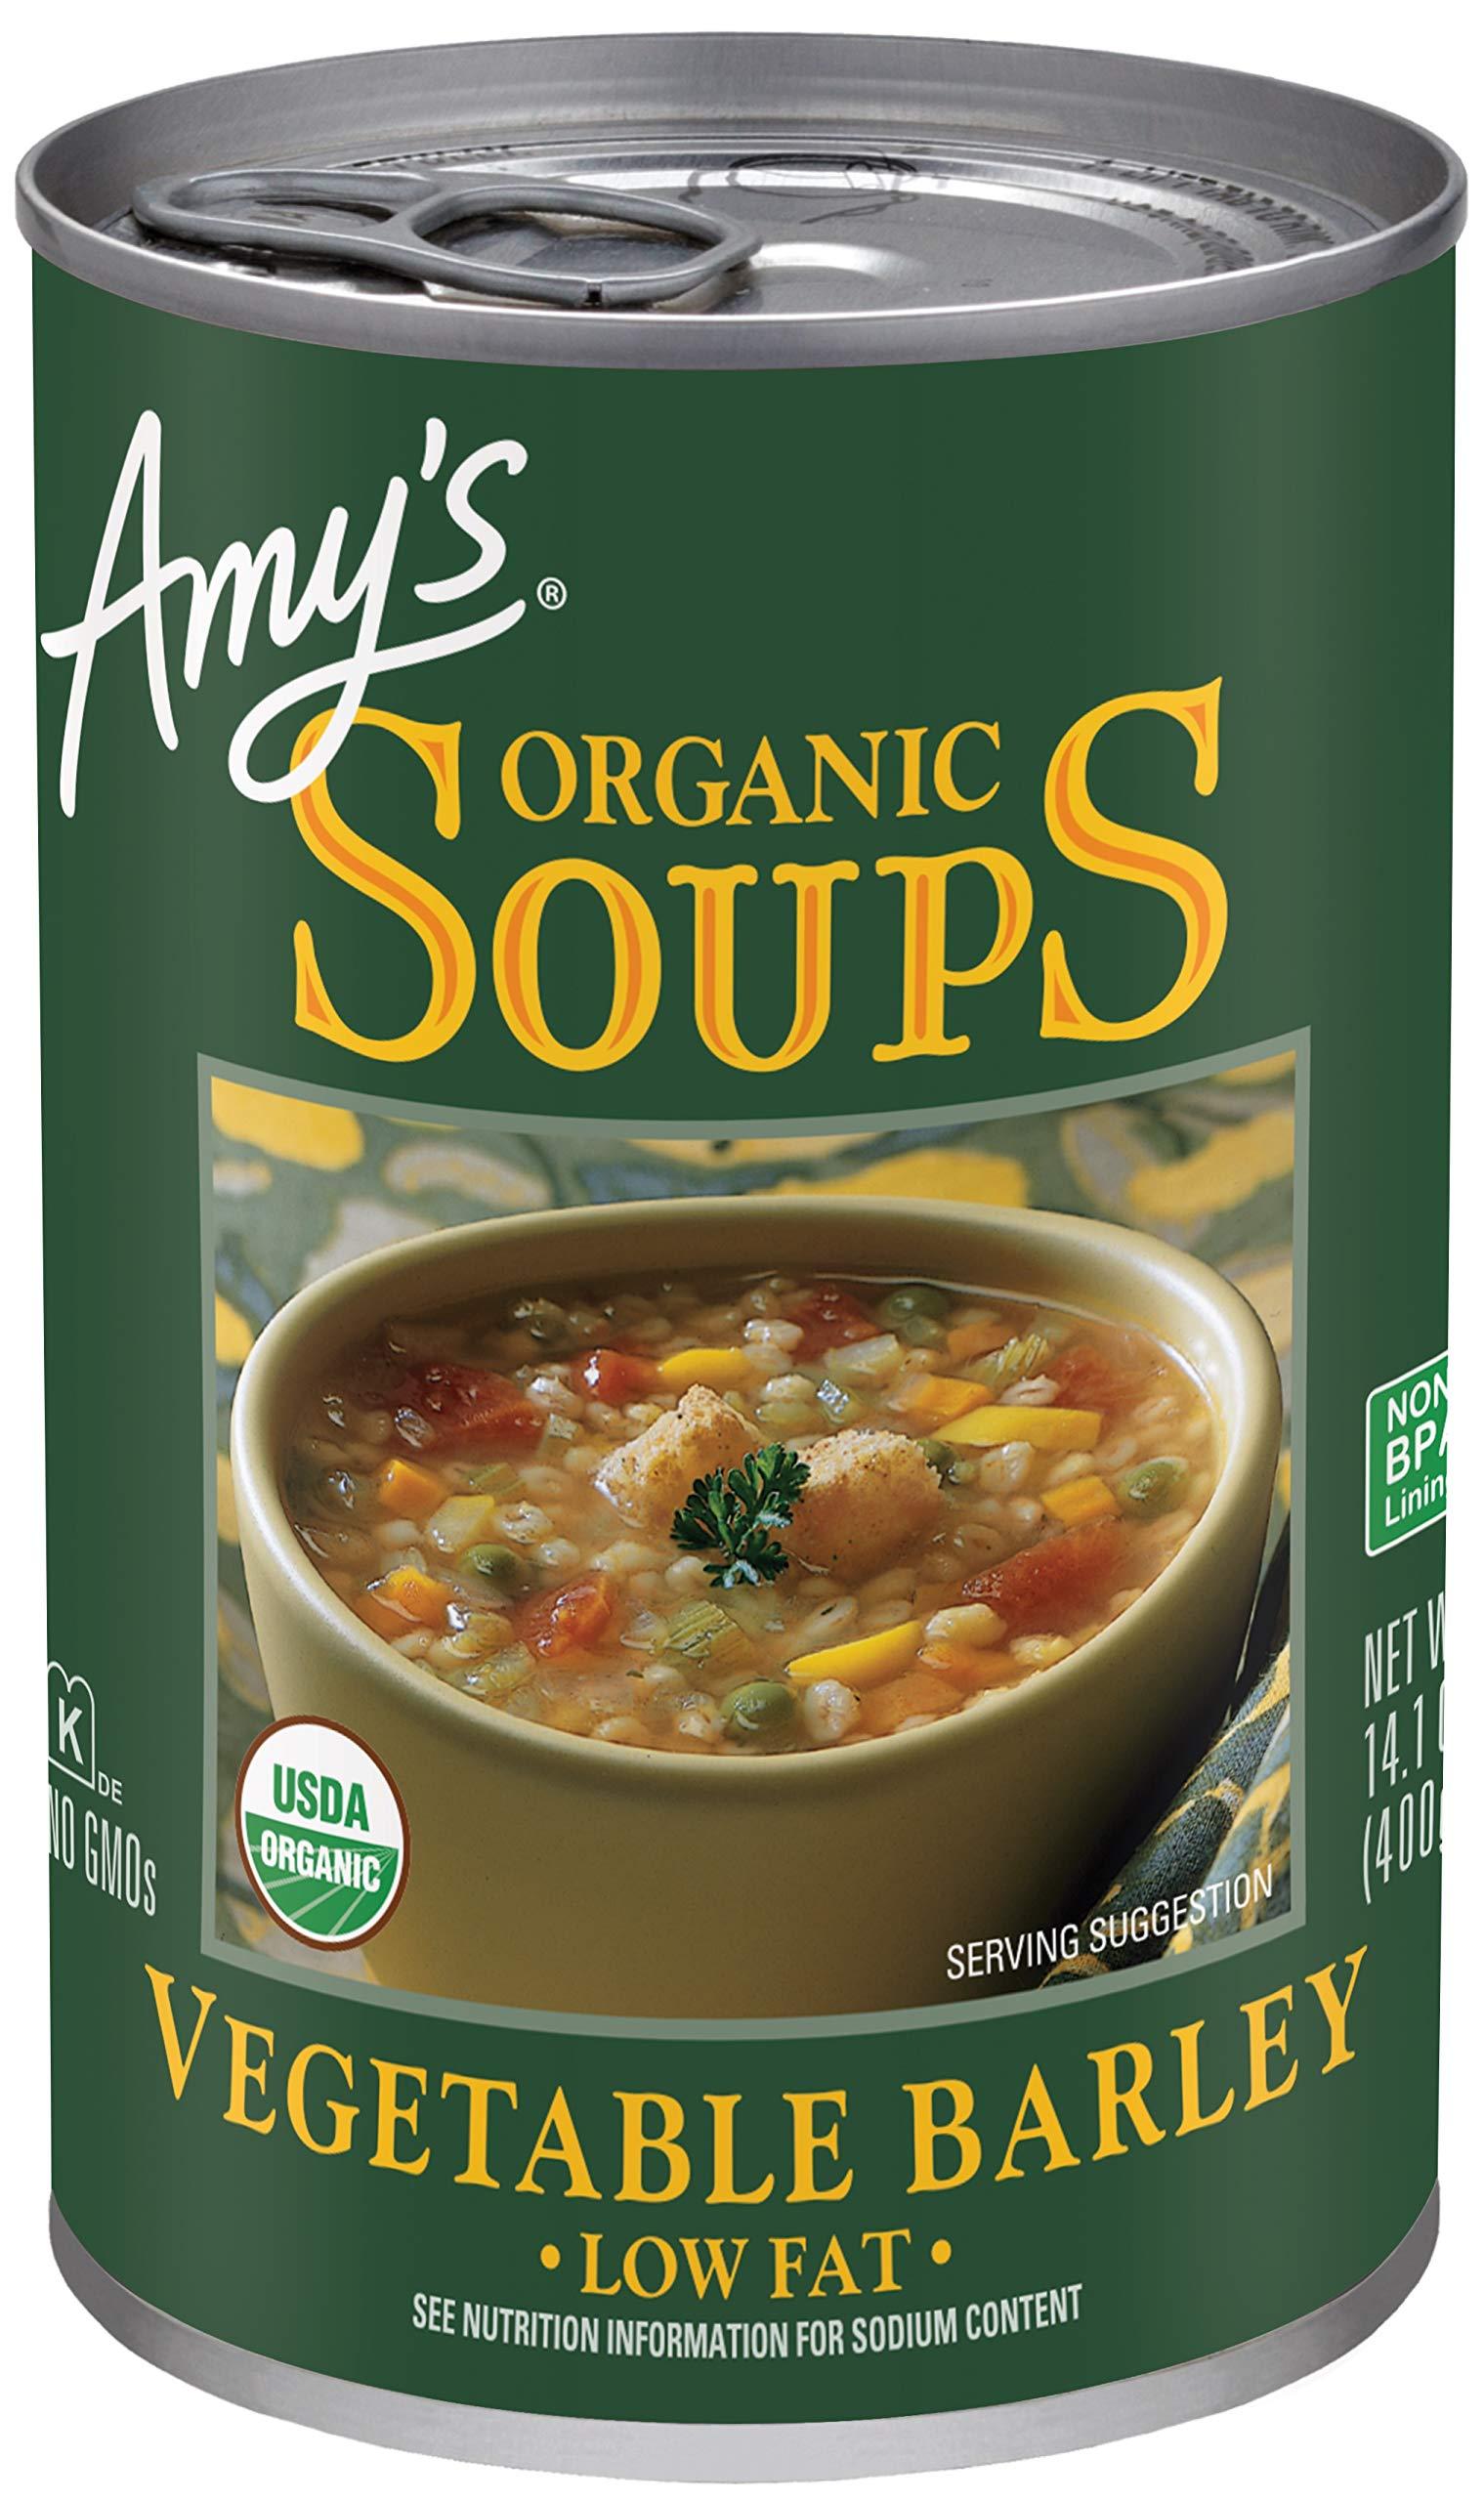 Amy's Organic Vegetable Barley Soup, Low Fat, Vegan, 14.1-Ounce